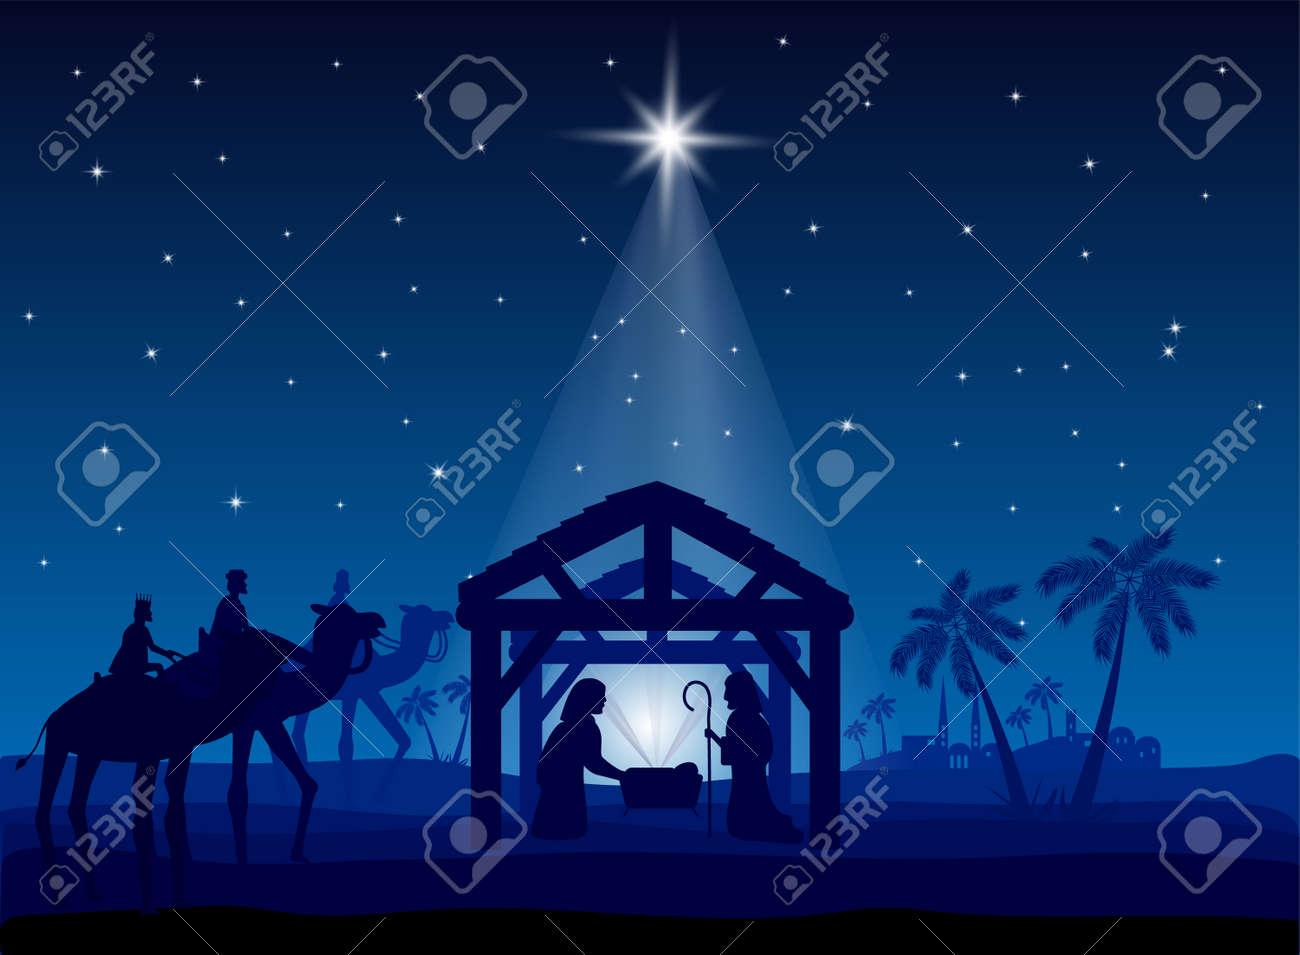 Nativity scene, Christmas star on blue sky and birth of Jesus, illustration - 122835610